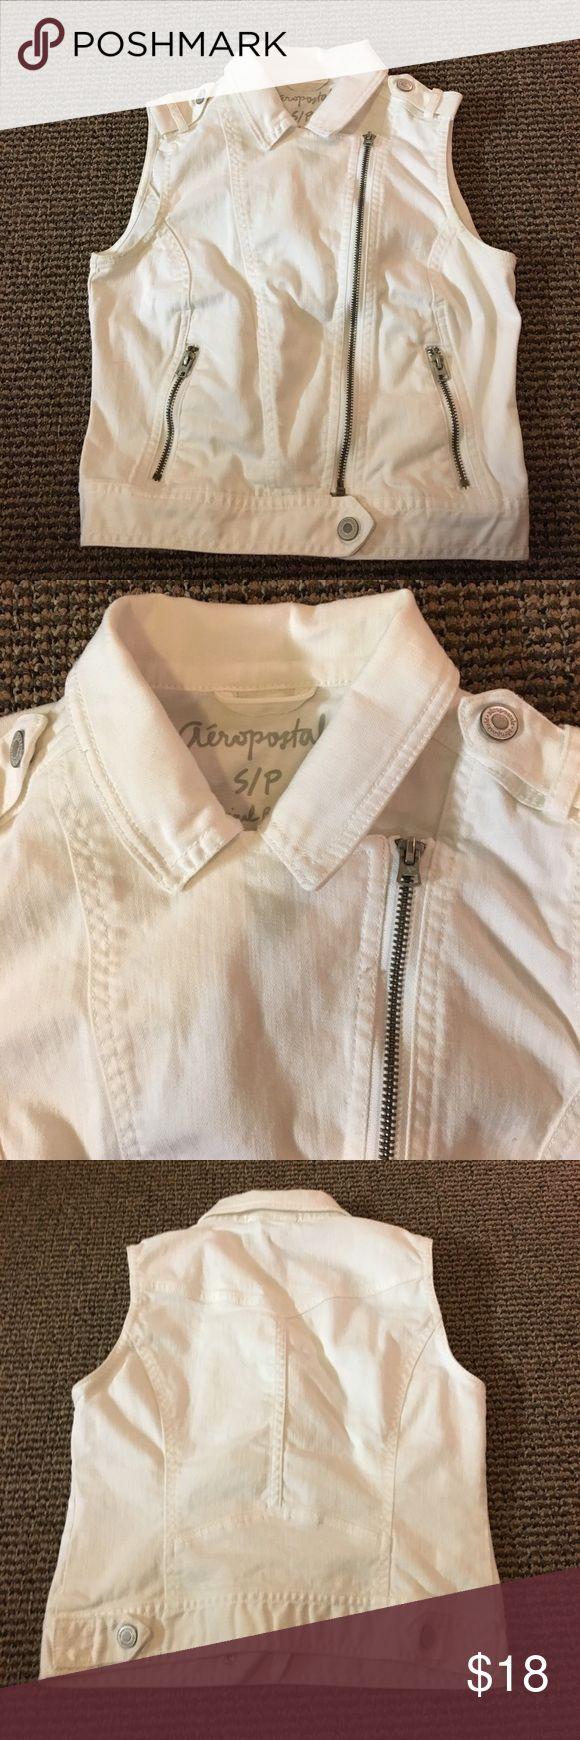 "Women's White Aeropostale Denim Vest Women's S/P white denim vest by Aeropostale                 Approximate Measurements:                                                Chest seam to seam:  16""                                                       Length (back under collar to bottom of vest:  17"" Aeropostale Jackets & Coats Vests"